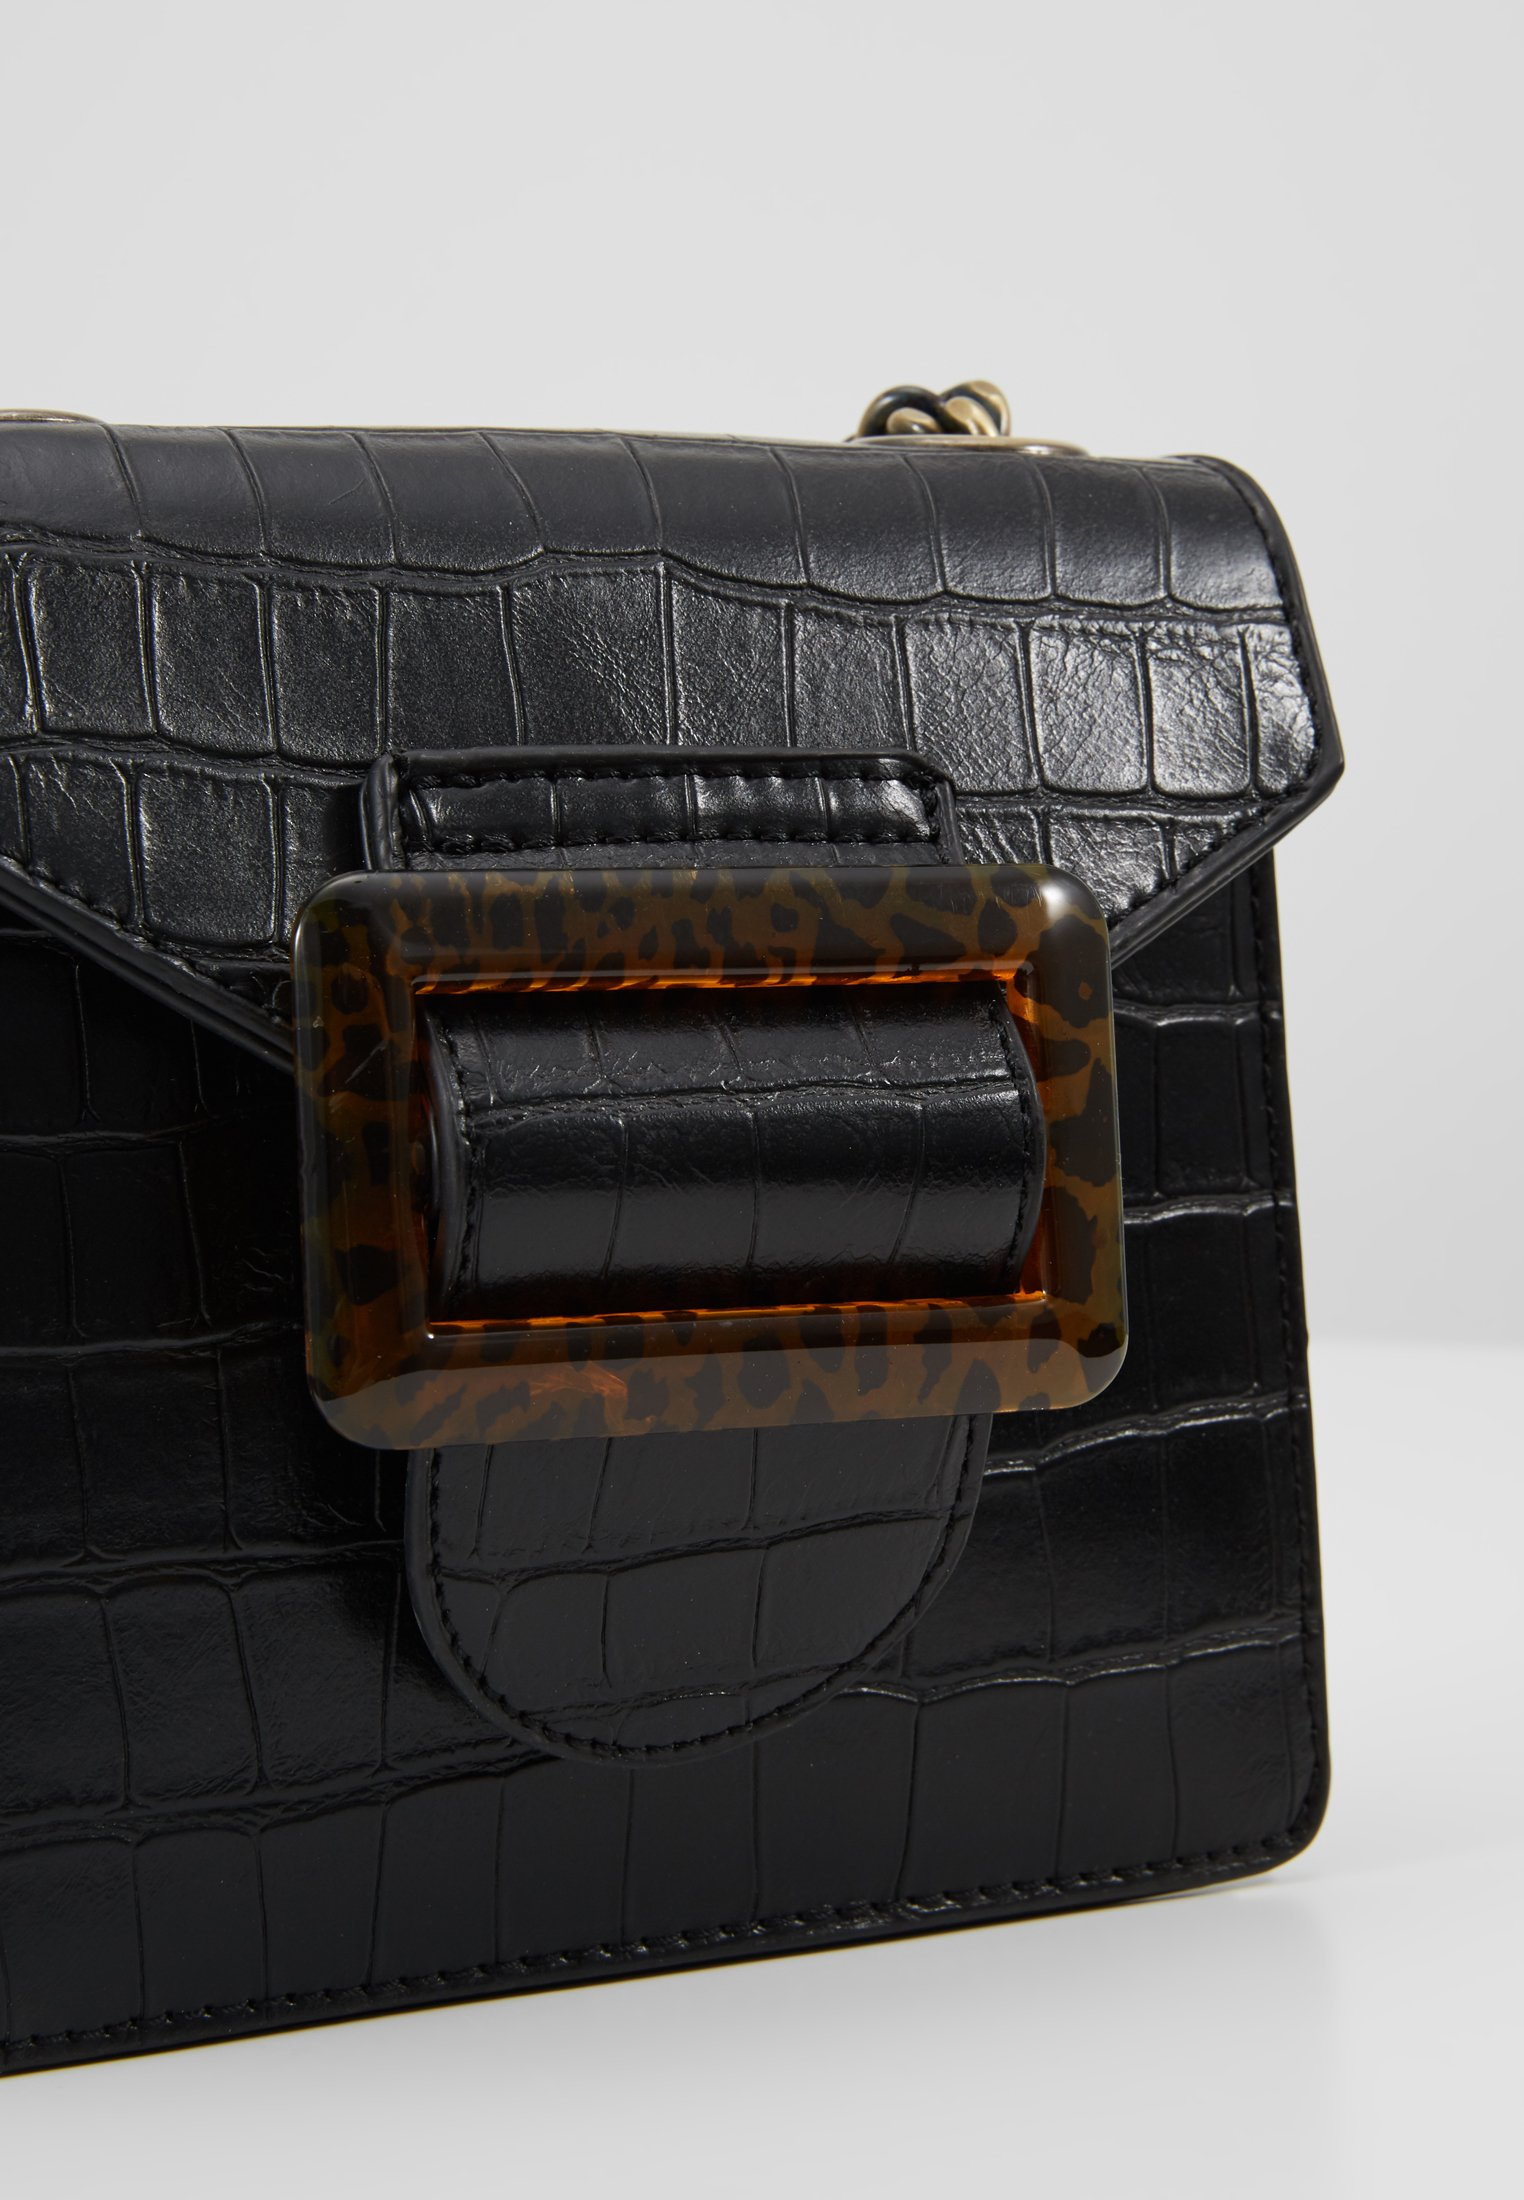 Liars & Lovers Shoulder Bag - Sac Bandoulière Black